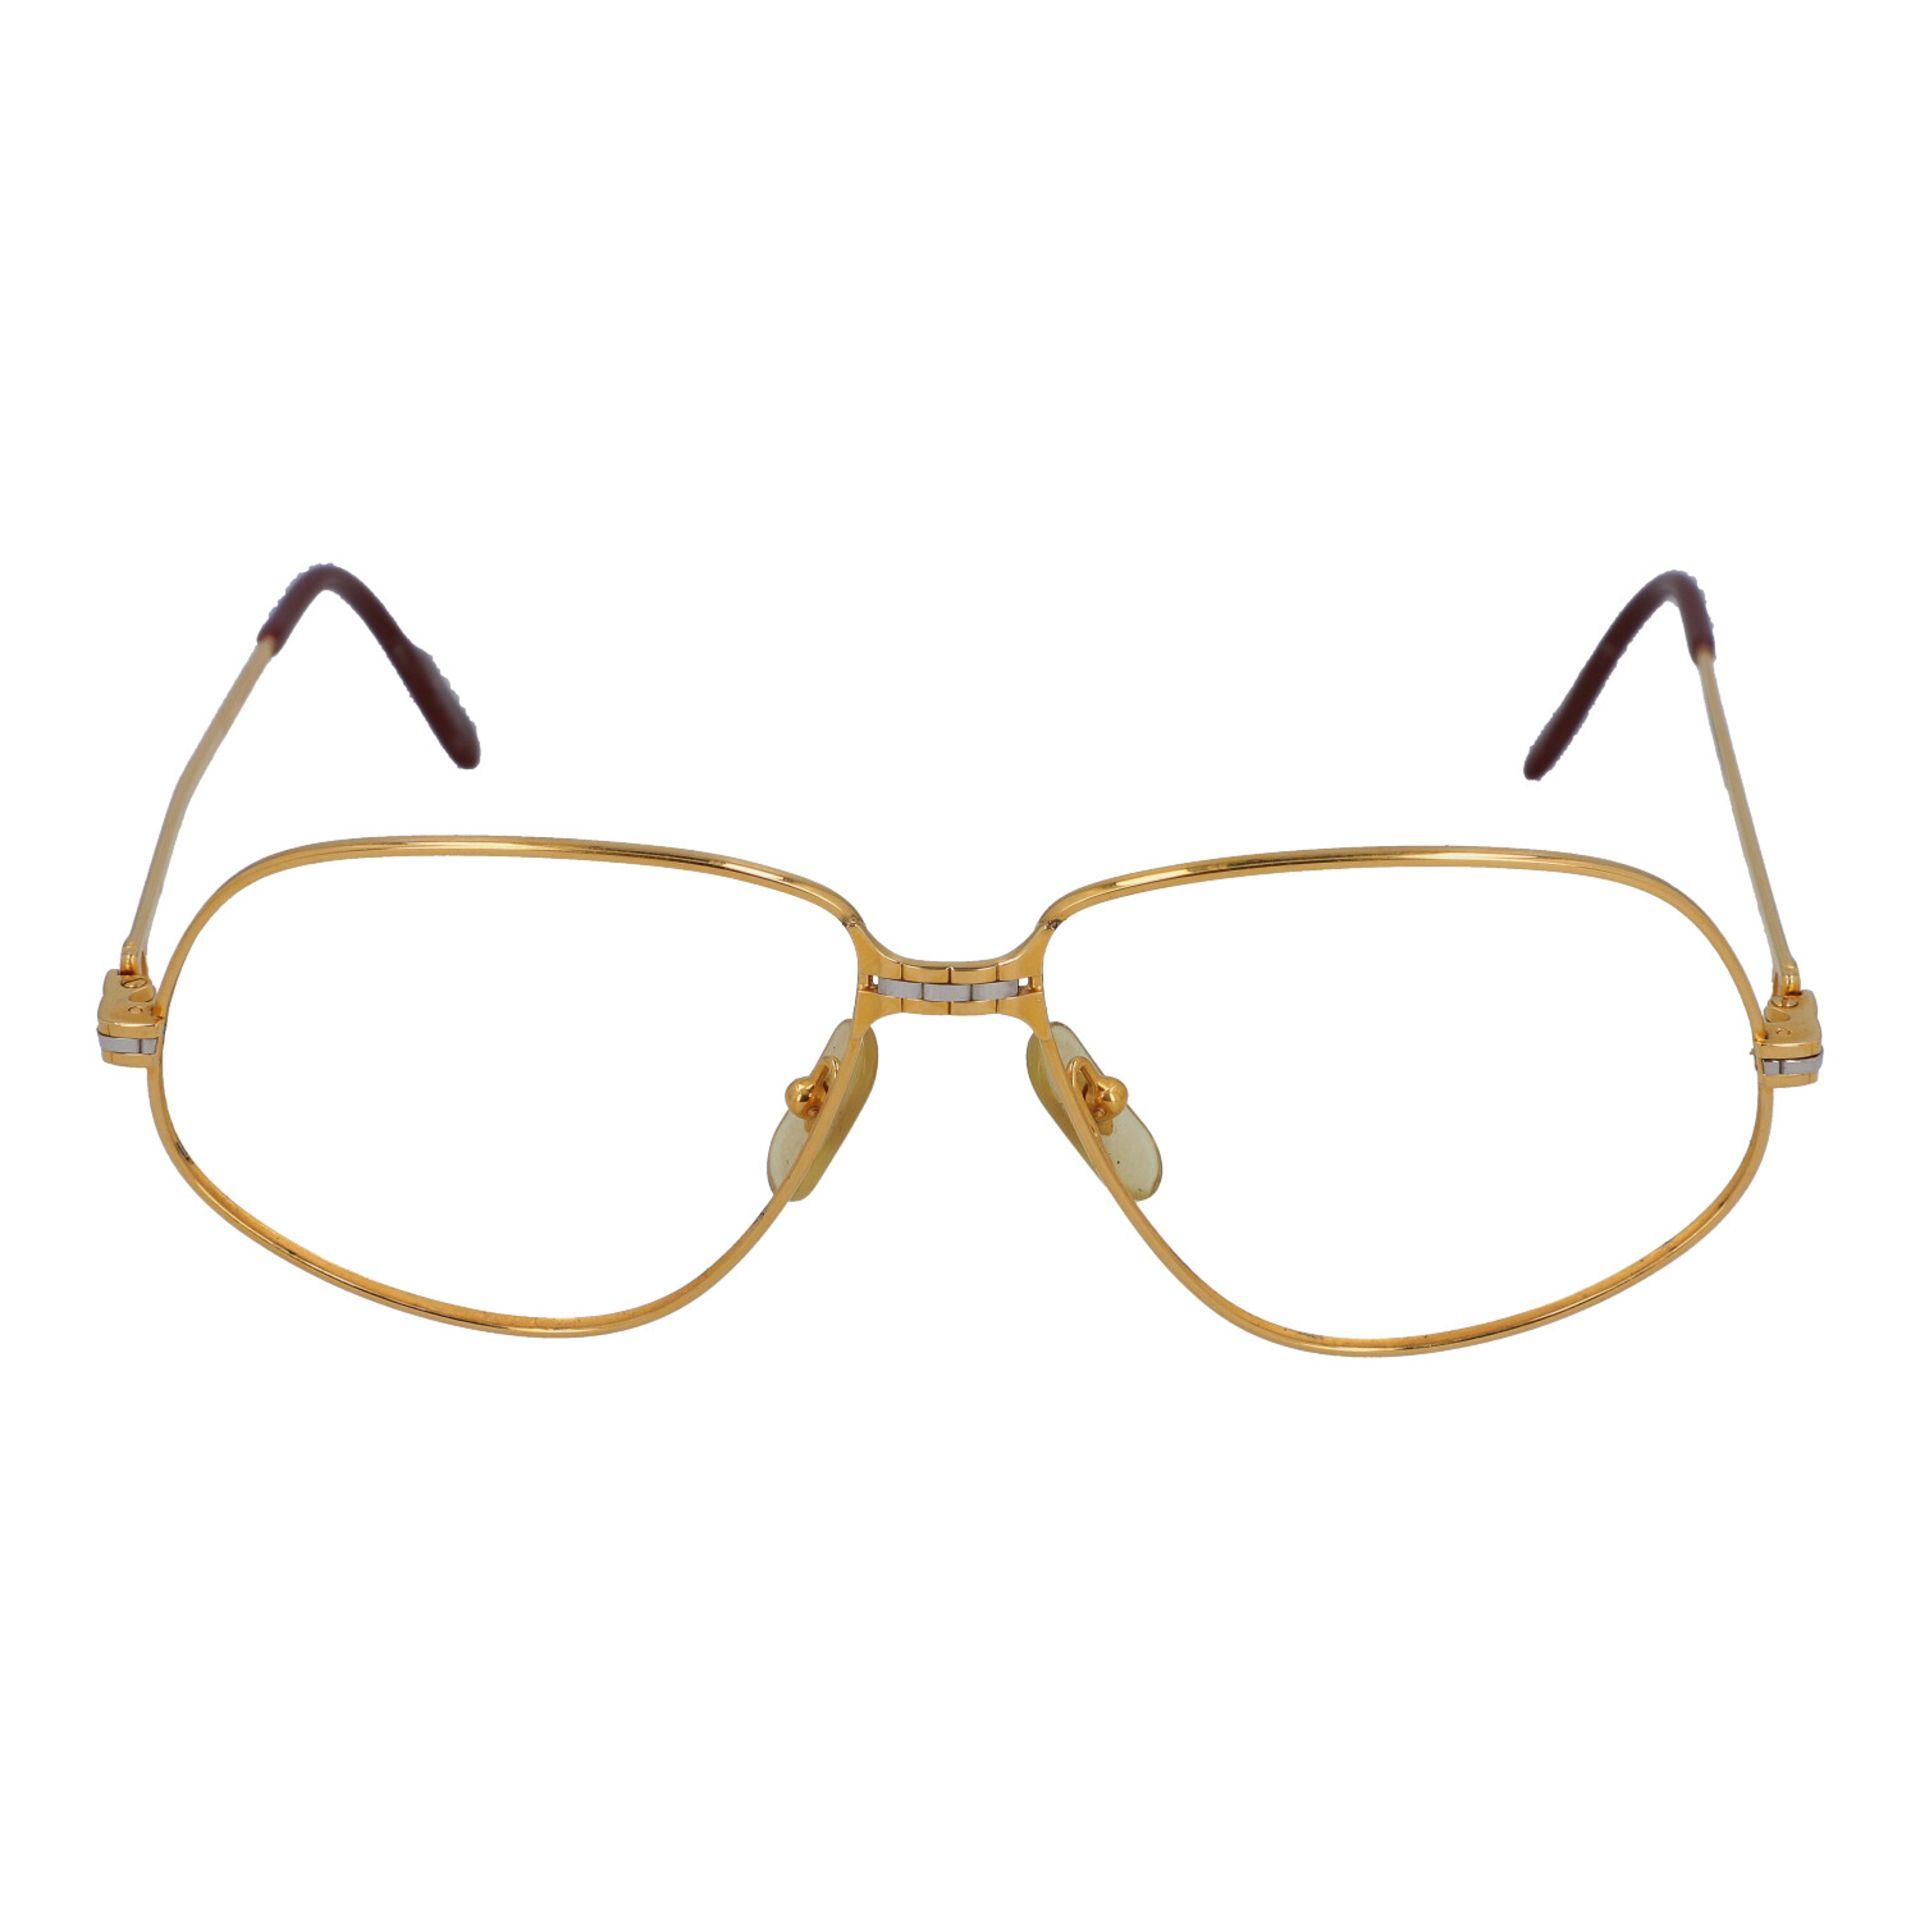 "CARTIER Brillengestell ""PANTHERE"", Koll.: 1988 in Paris. Vergoldetes Modell ohne Gläs"